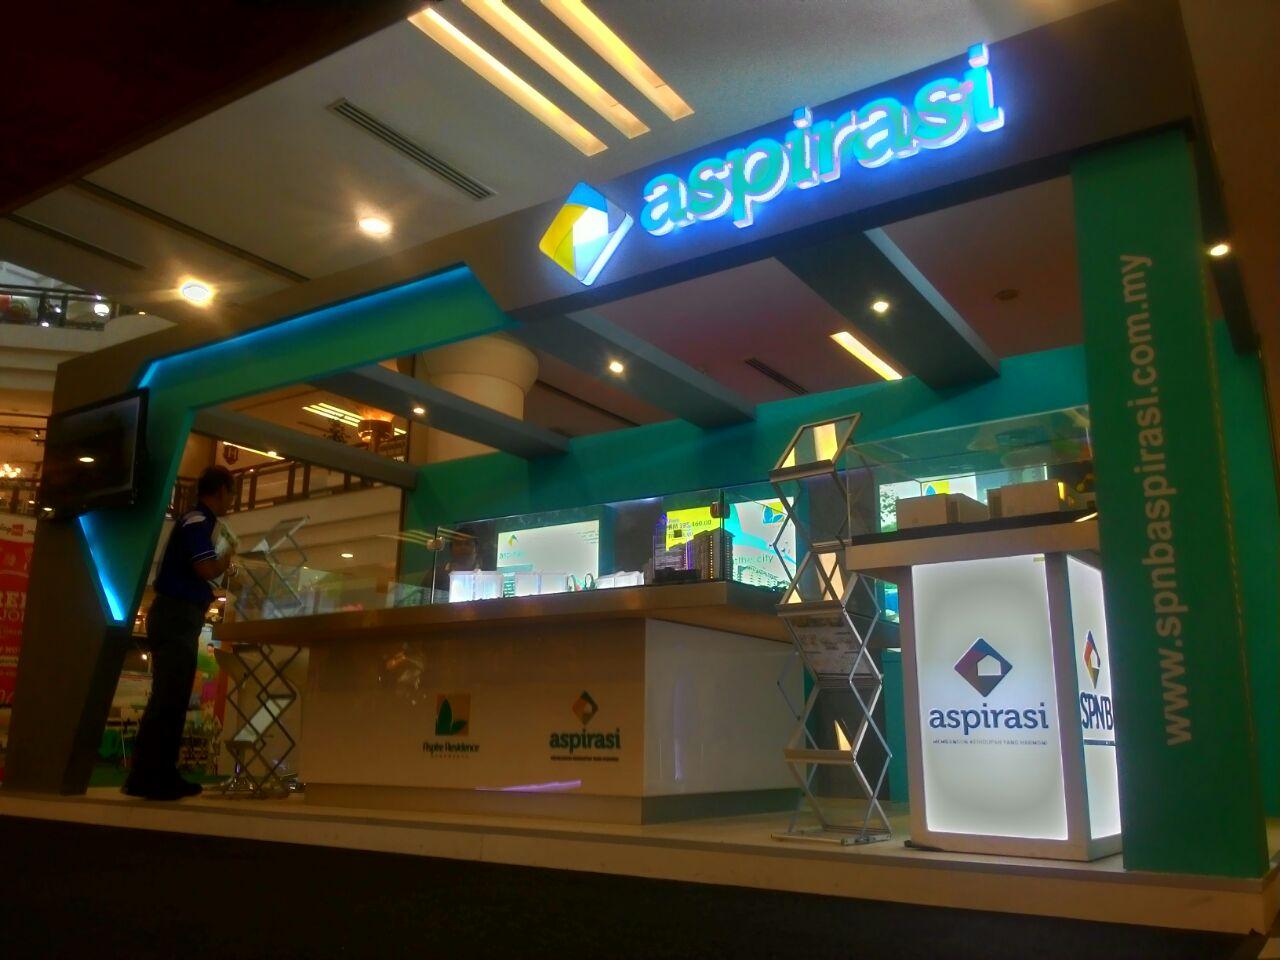 SPNB Aspirasi, One Utama